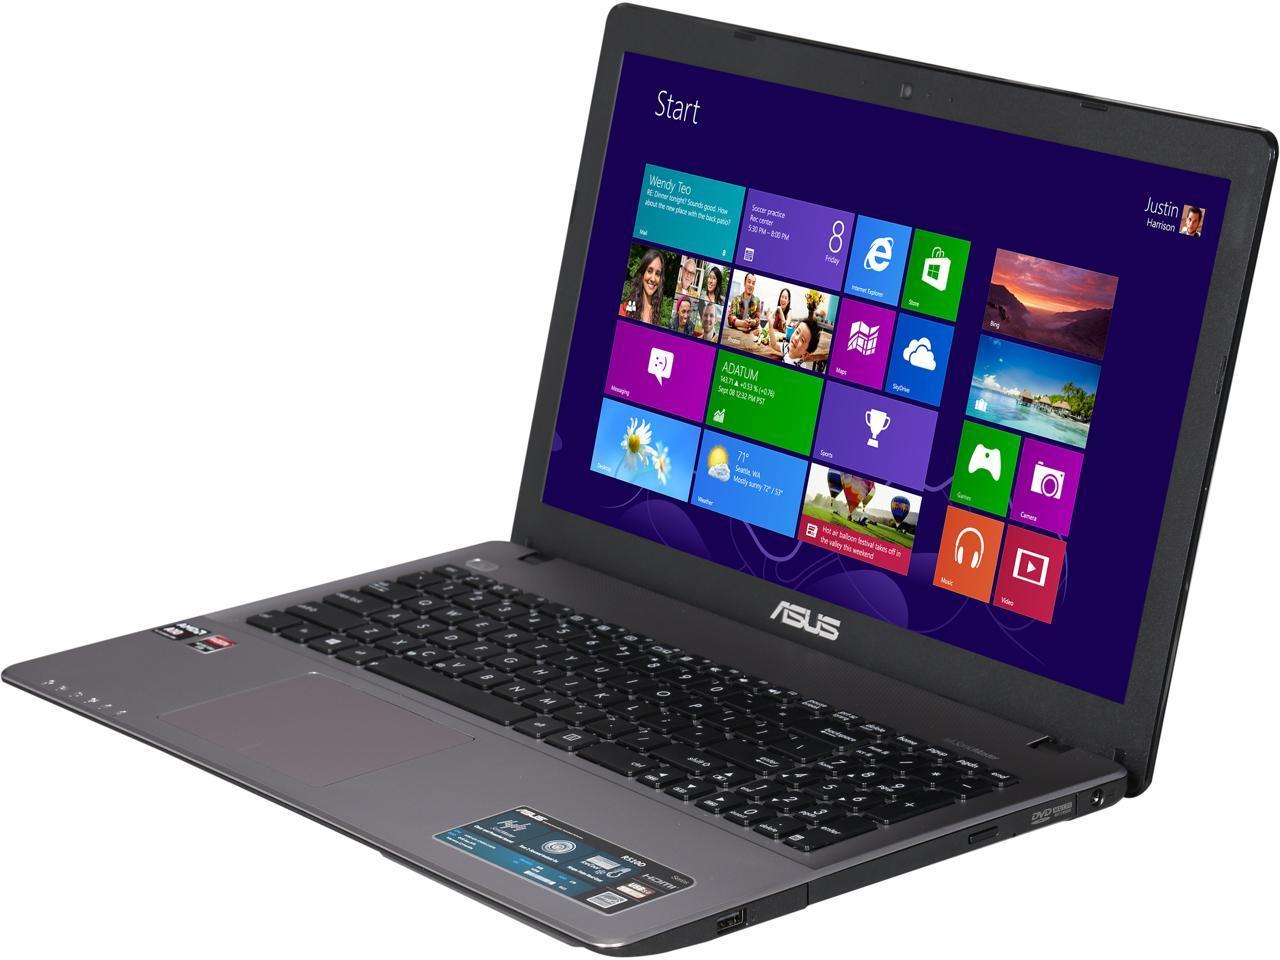 Asus Laptop R510dp Wh11 Amd A10 Series A10 5750m 2 50 Ghz 8 Gb Memory 1 Tb Hdd Amd Radeon Hd 8670m 15 6 Windows 8 1 64 Bit Newegg Com